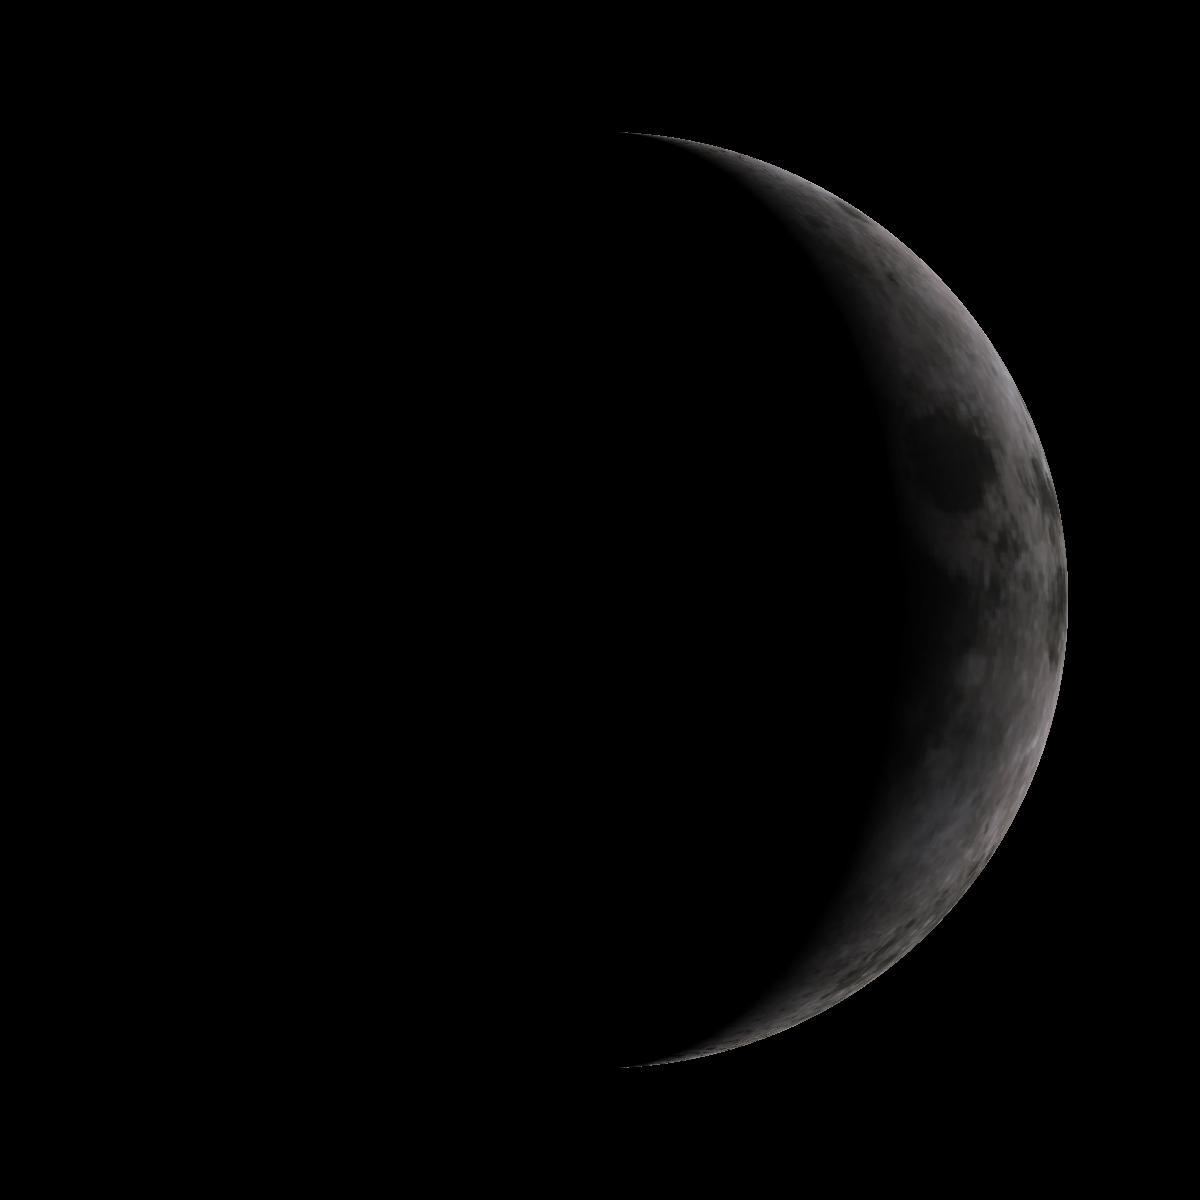 Lune du 1er novembre 2019